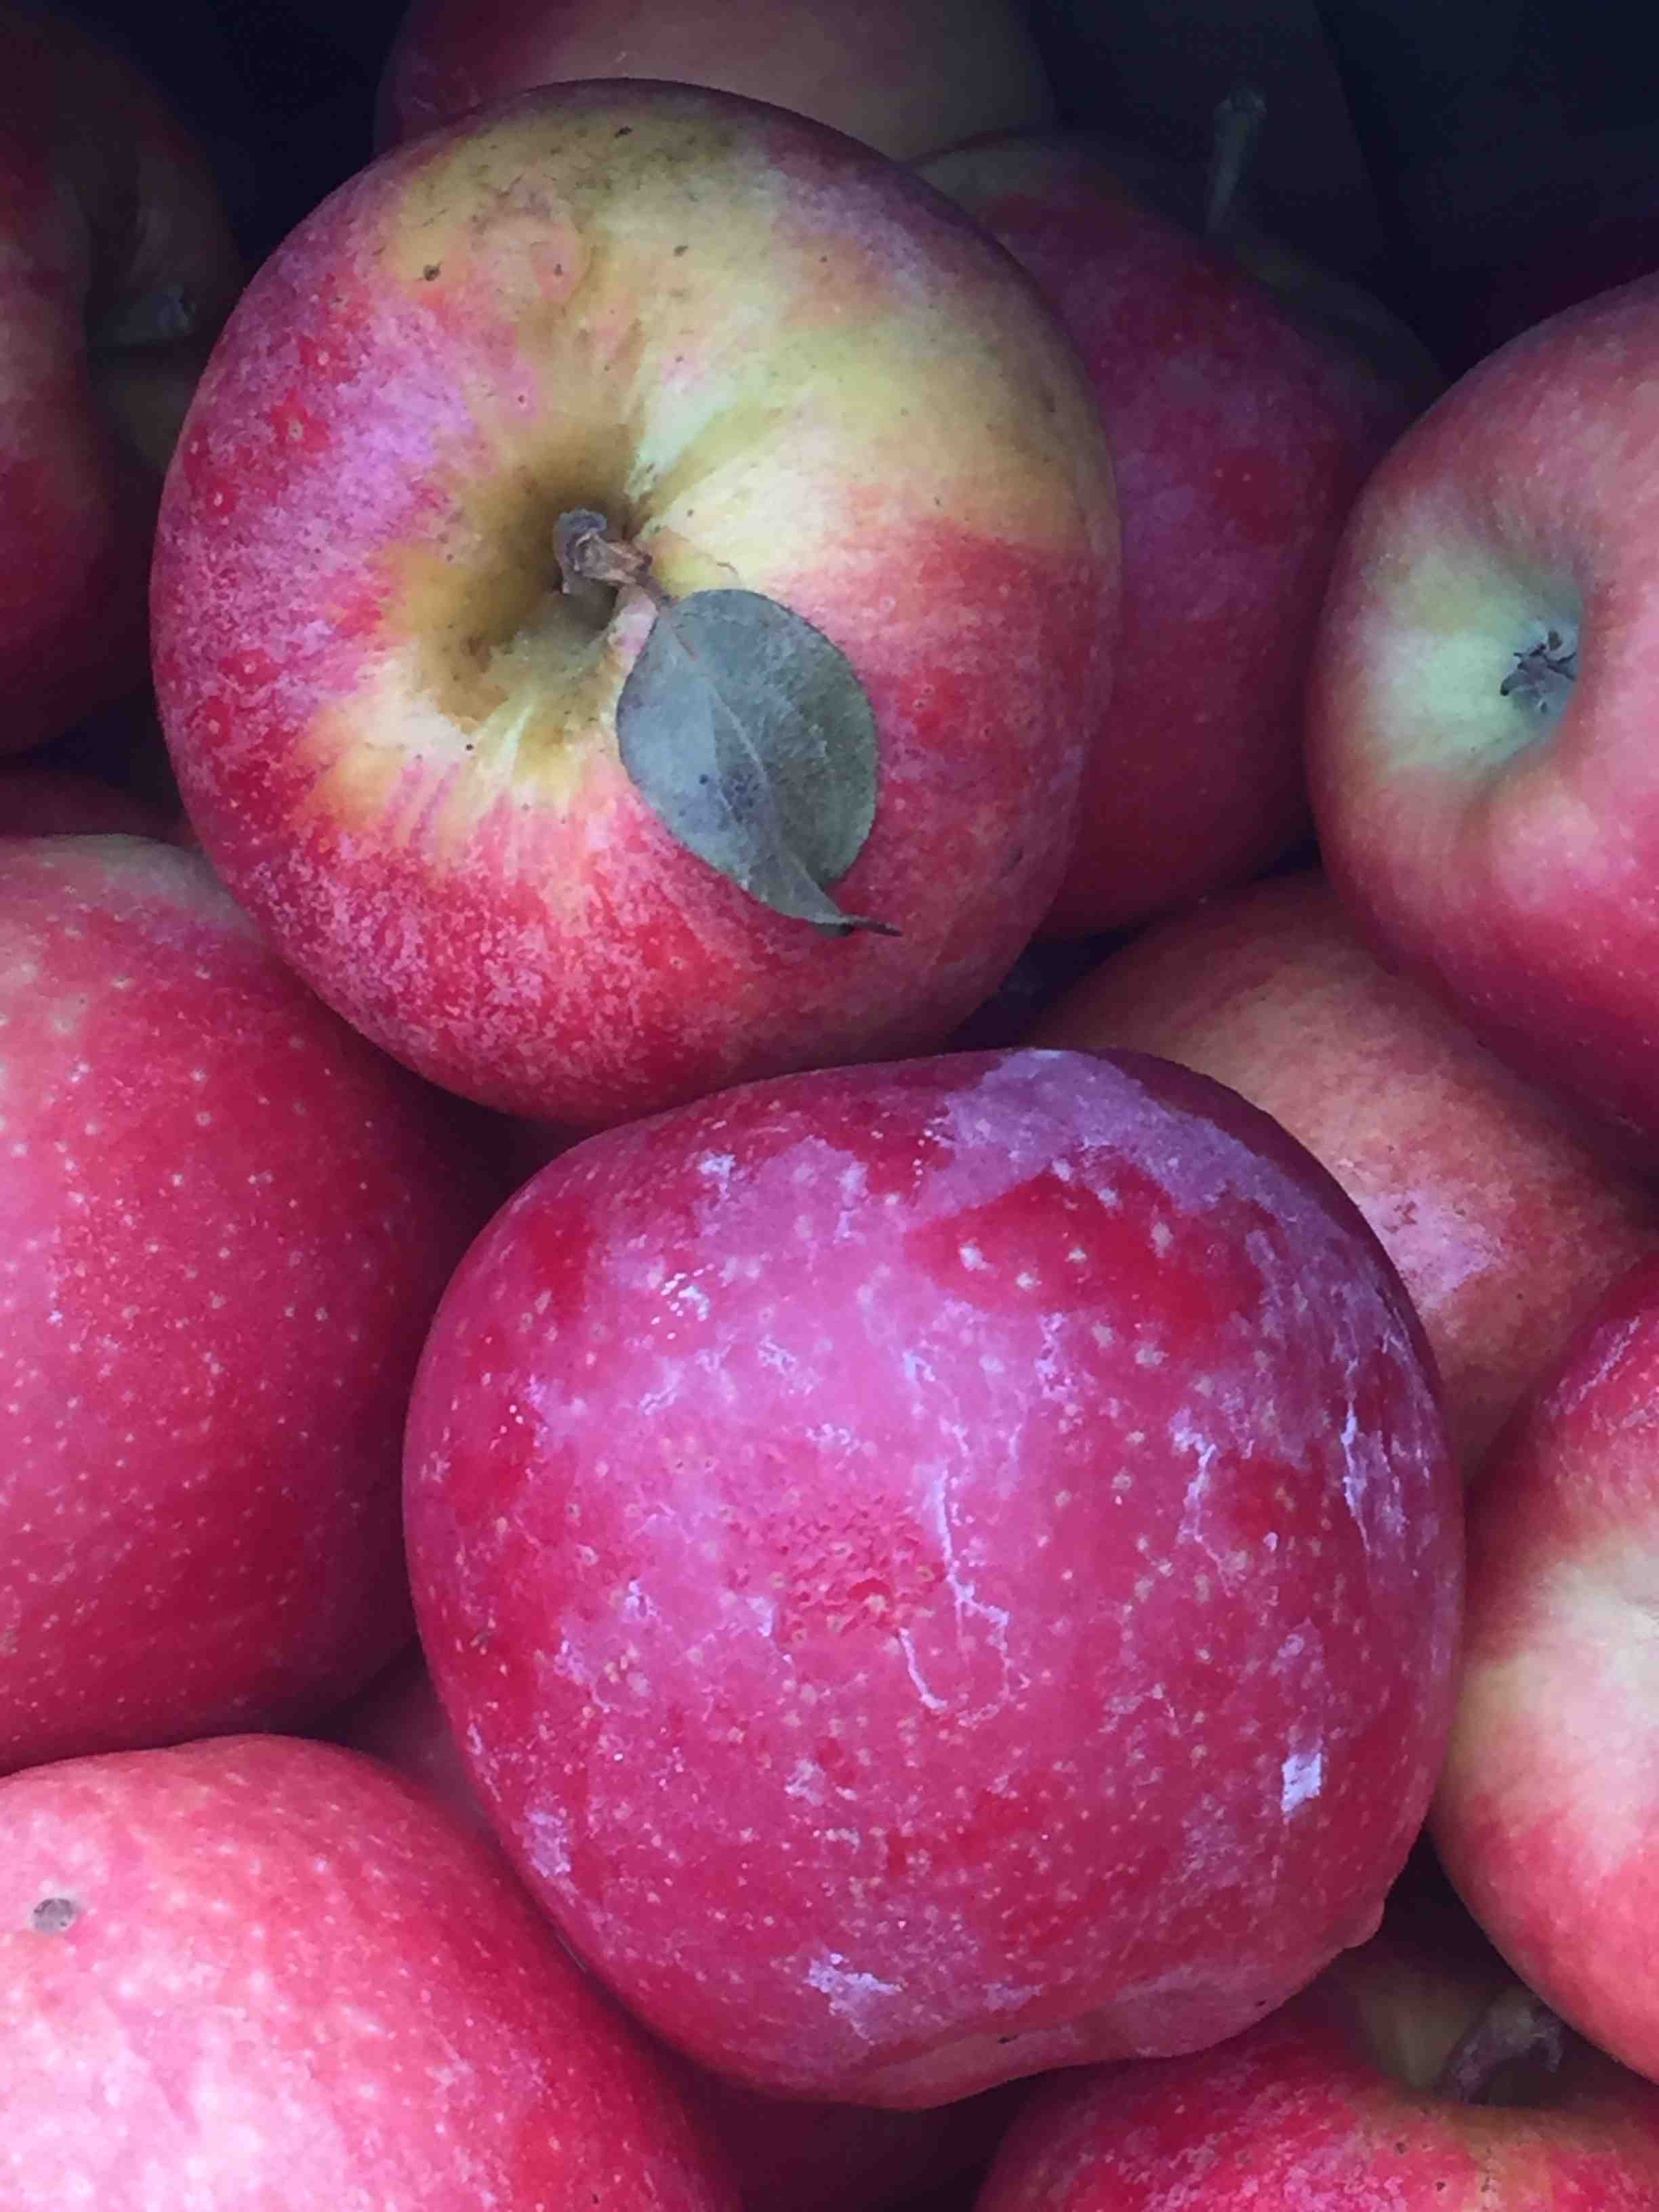 Apples - Reese Halter.jpg